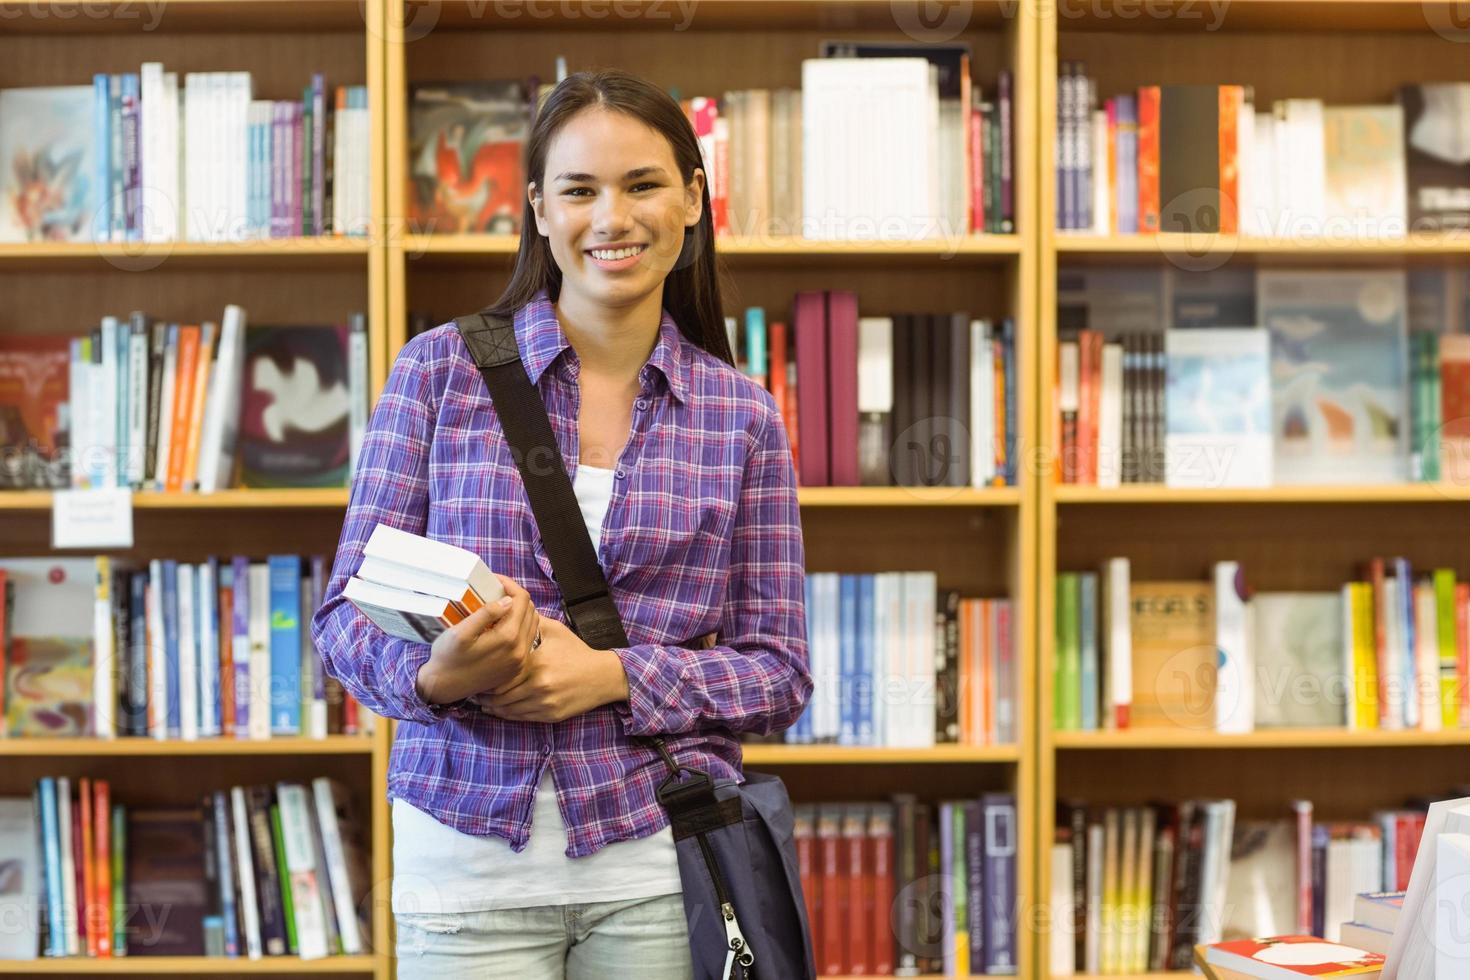 lächelnder Universitätsstudent, der Lehrbuch hält foto